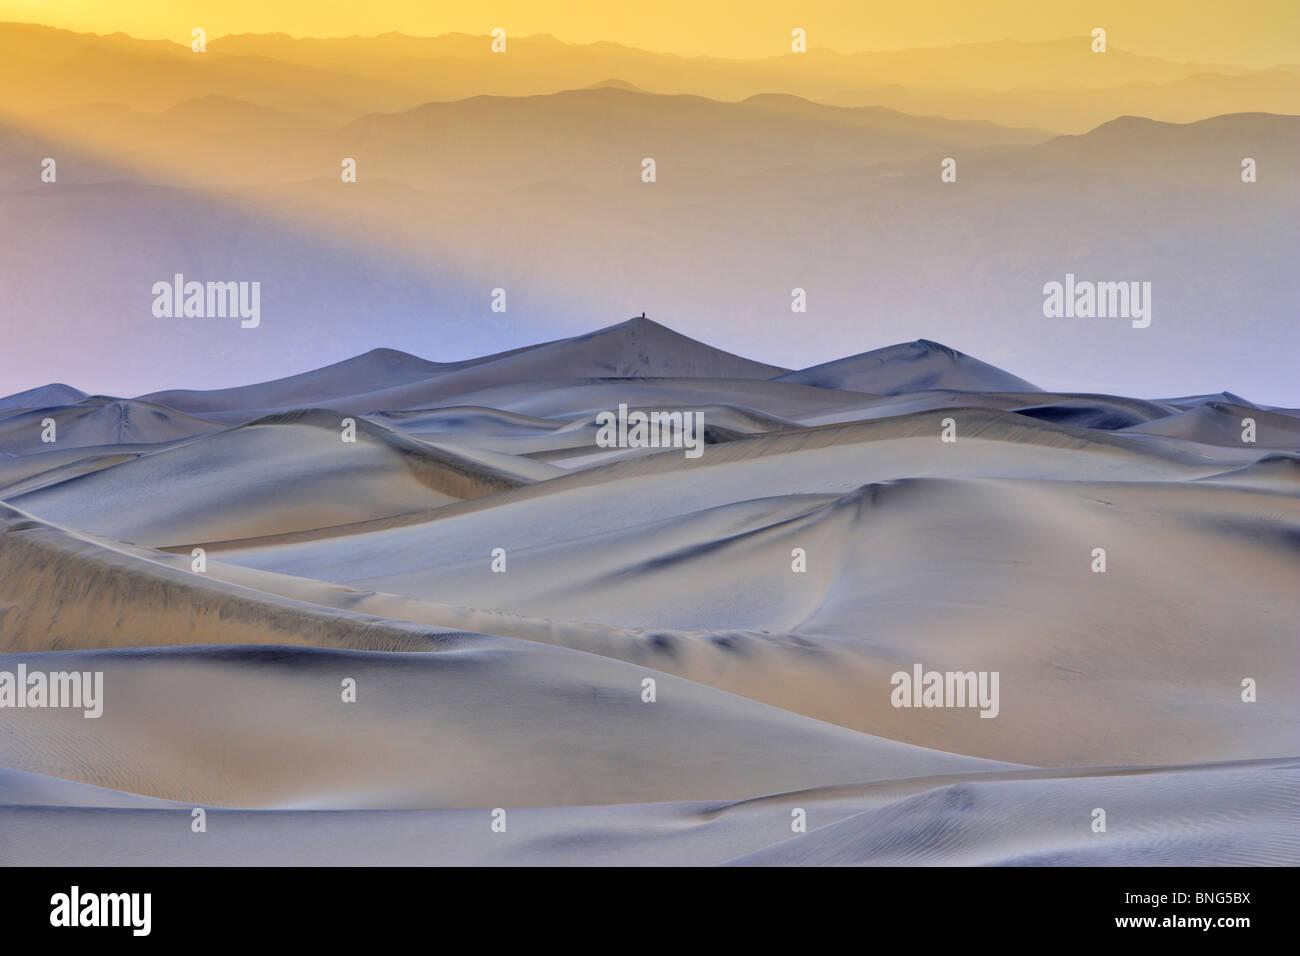 Sand dunes in a desert, Mesquite Flat Dunes, Death Valley, Panamint Range, California, USA - Stock Image